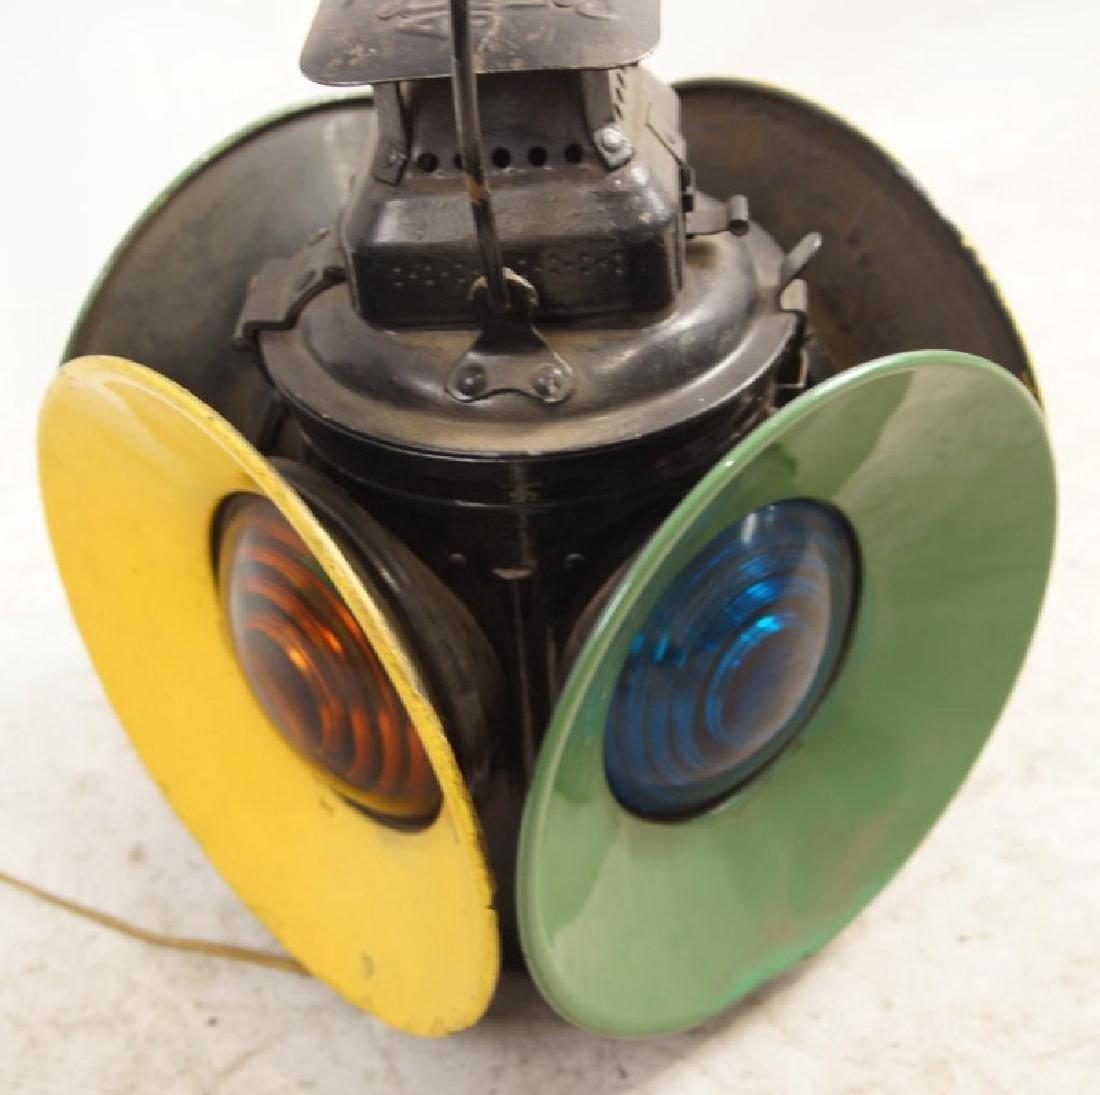 Antique railroad signal lantern - 4 light - 4